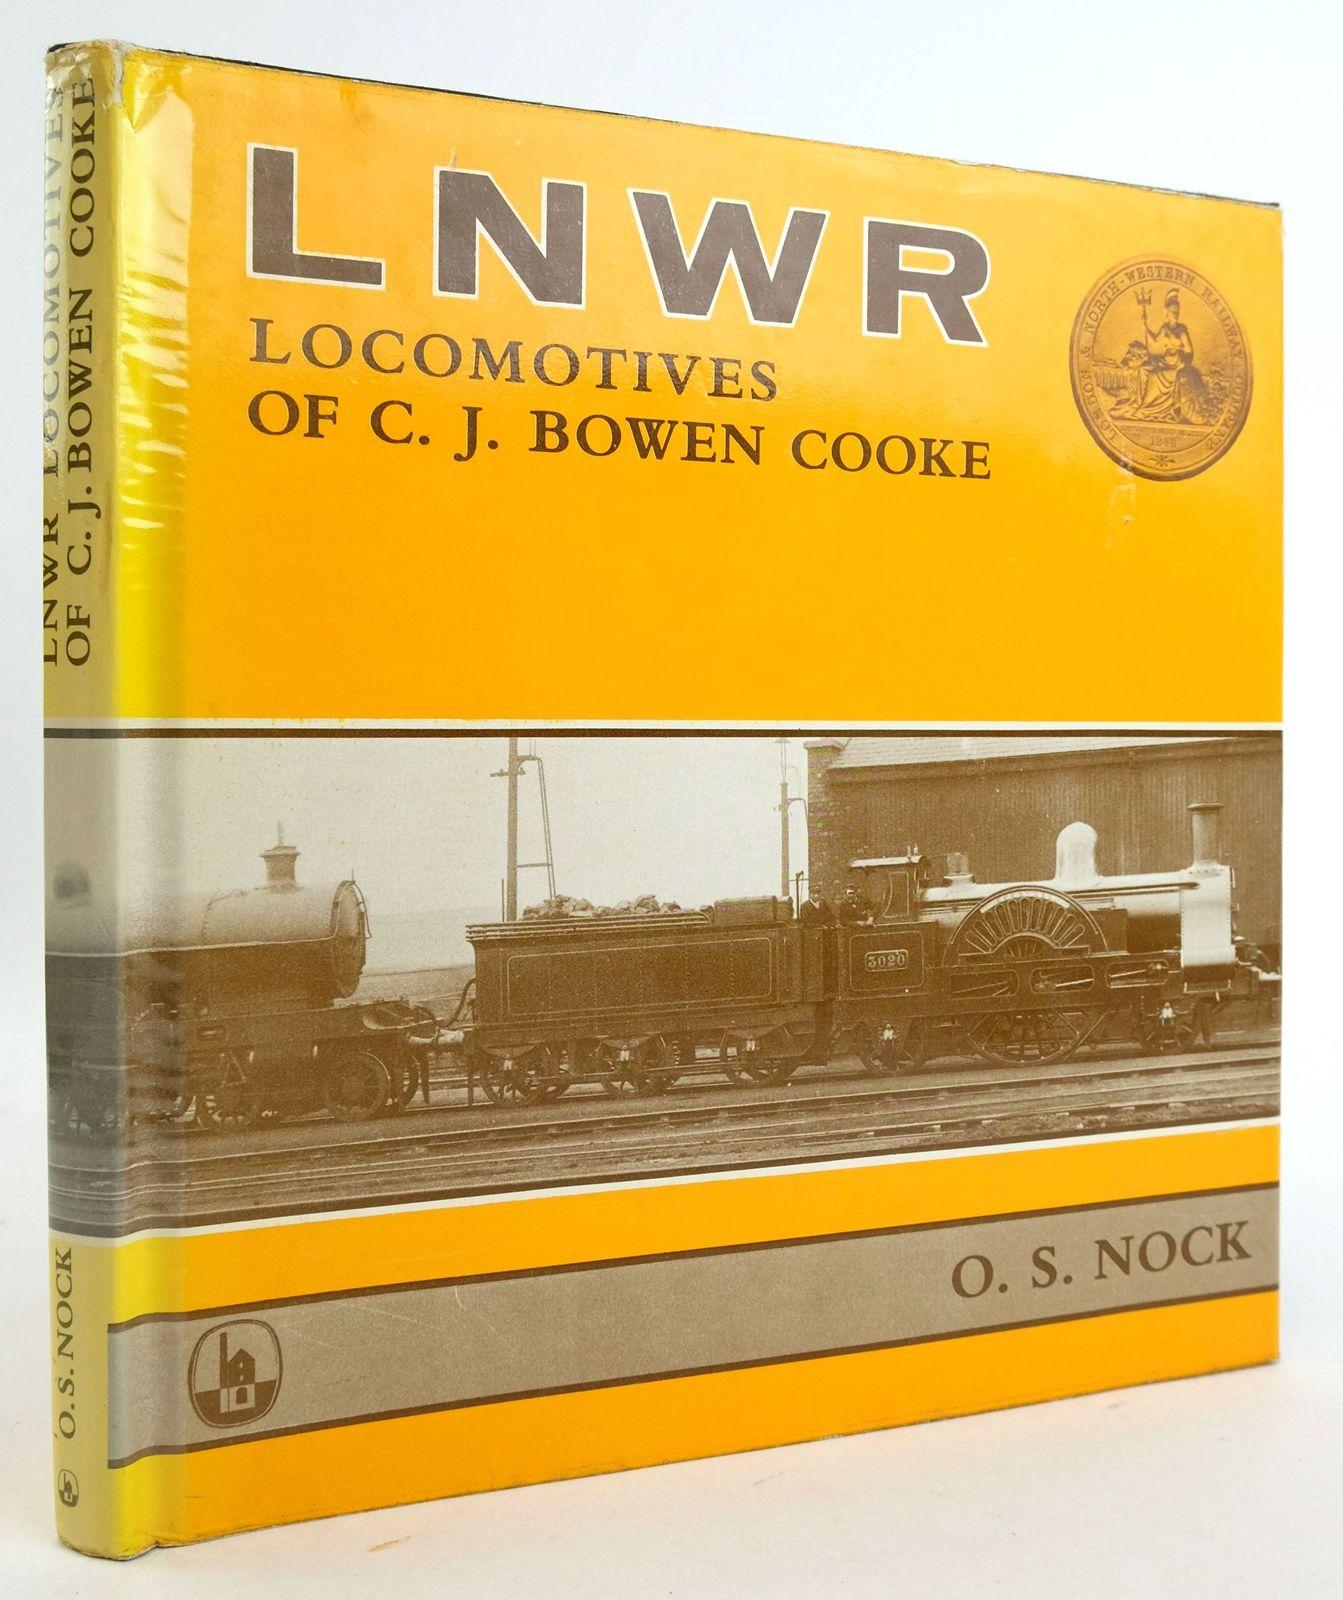 Photo of LNWR LOCOMOTIVES OF C.J. BOWEN COOKE- Stock Number: 1819873